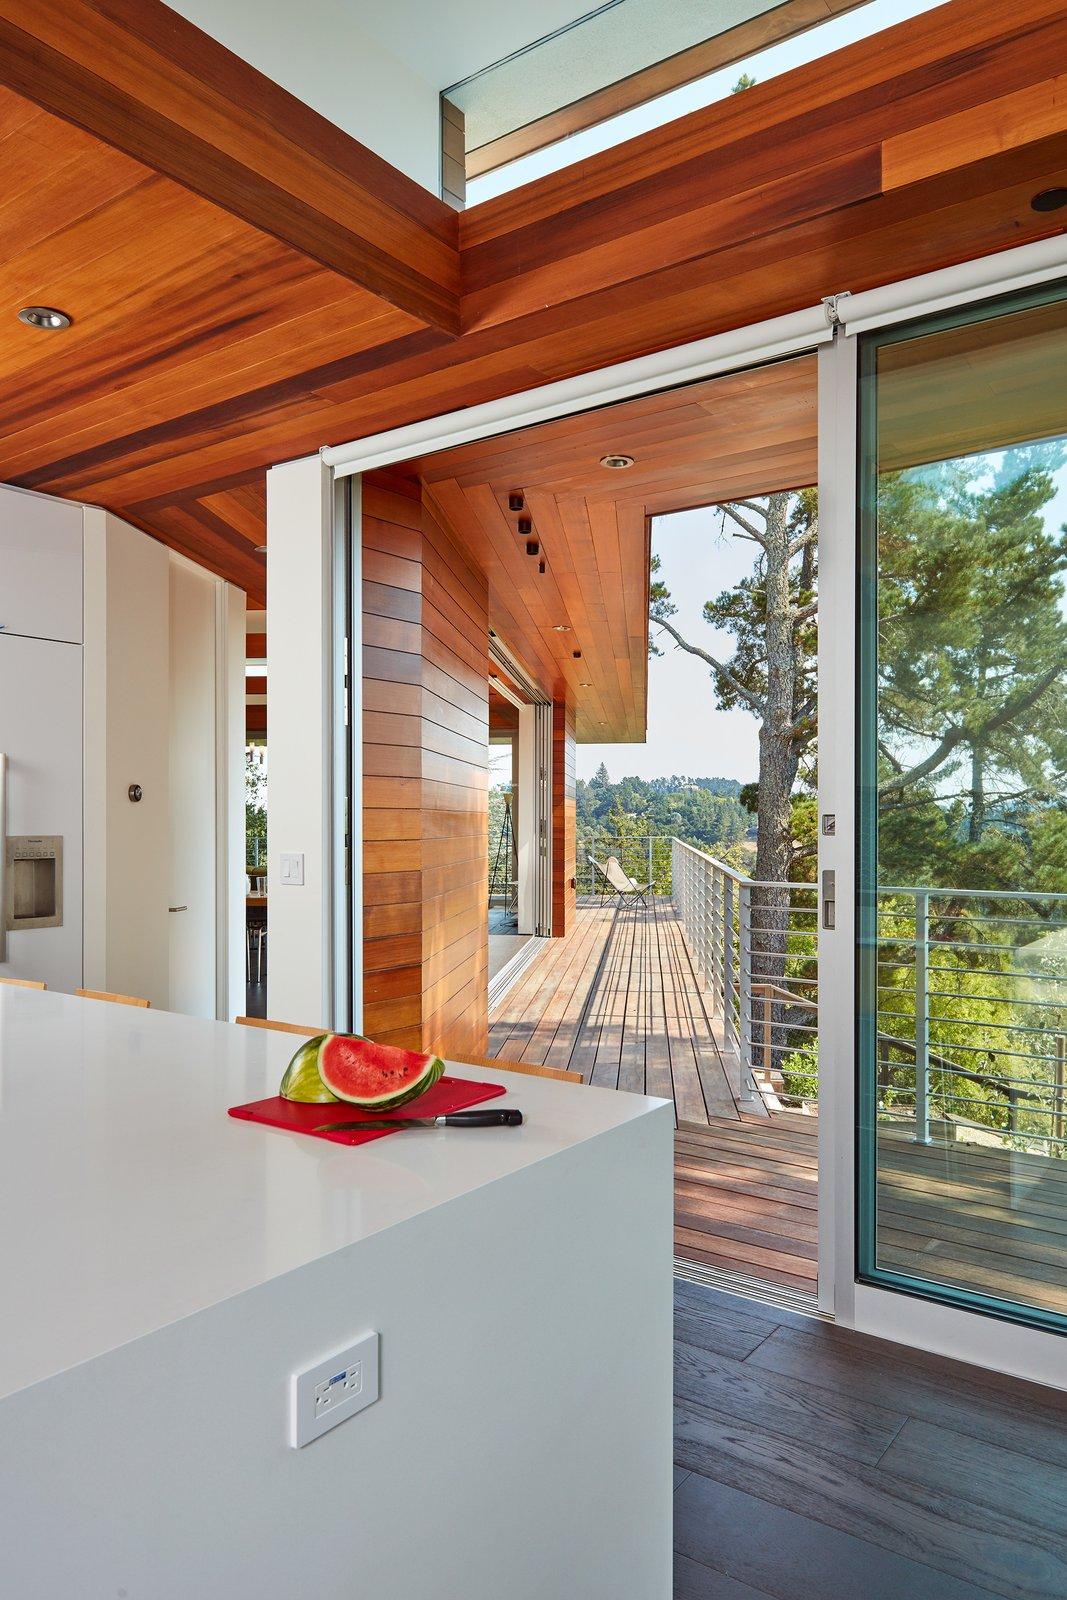 Swatt/Miers_Cheng-Reinganum Deck